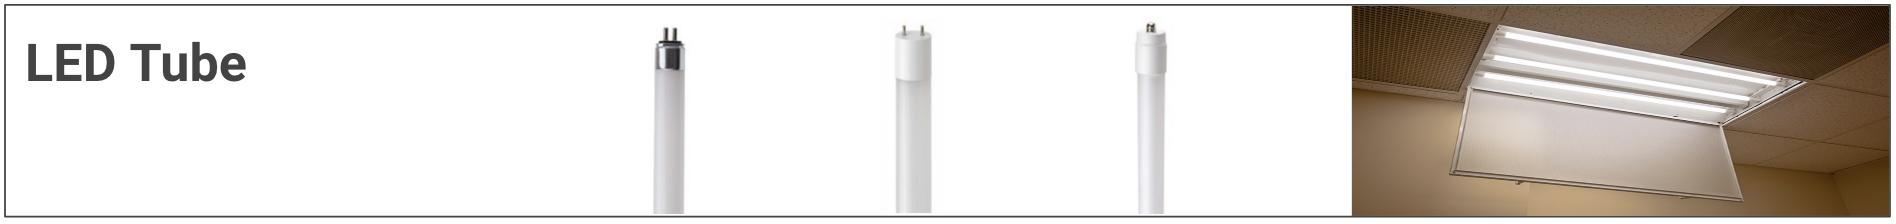 led-tubes.png